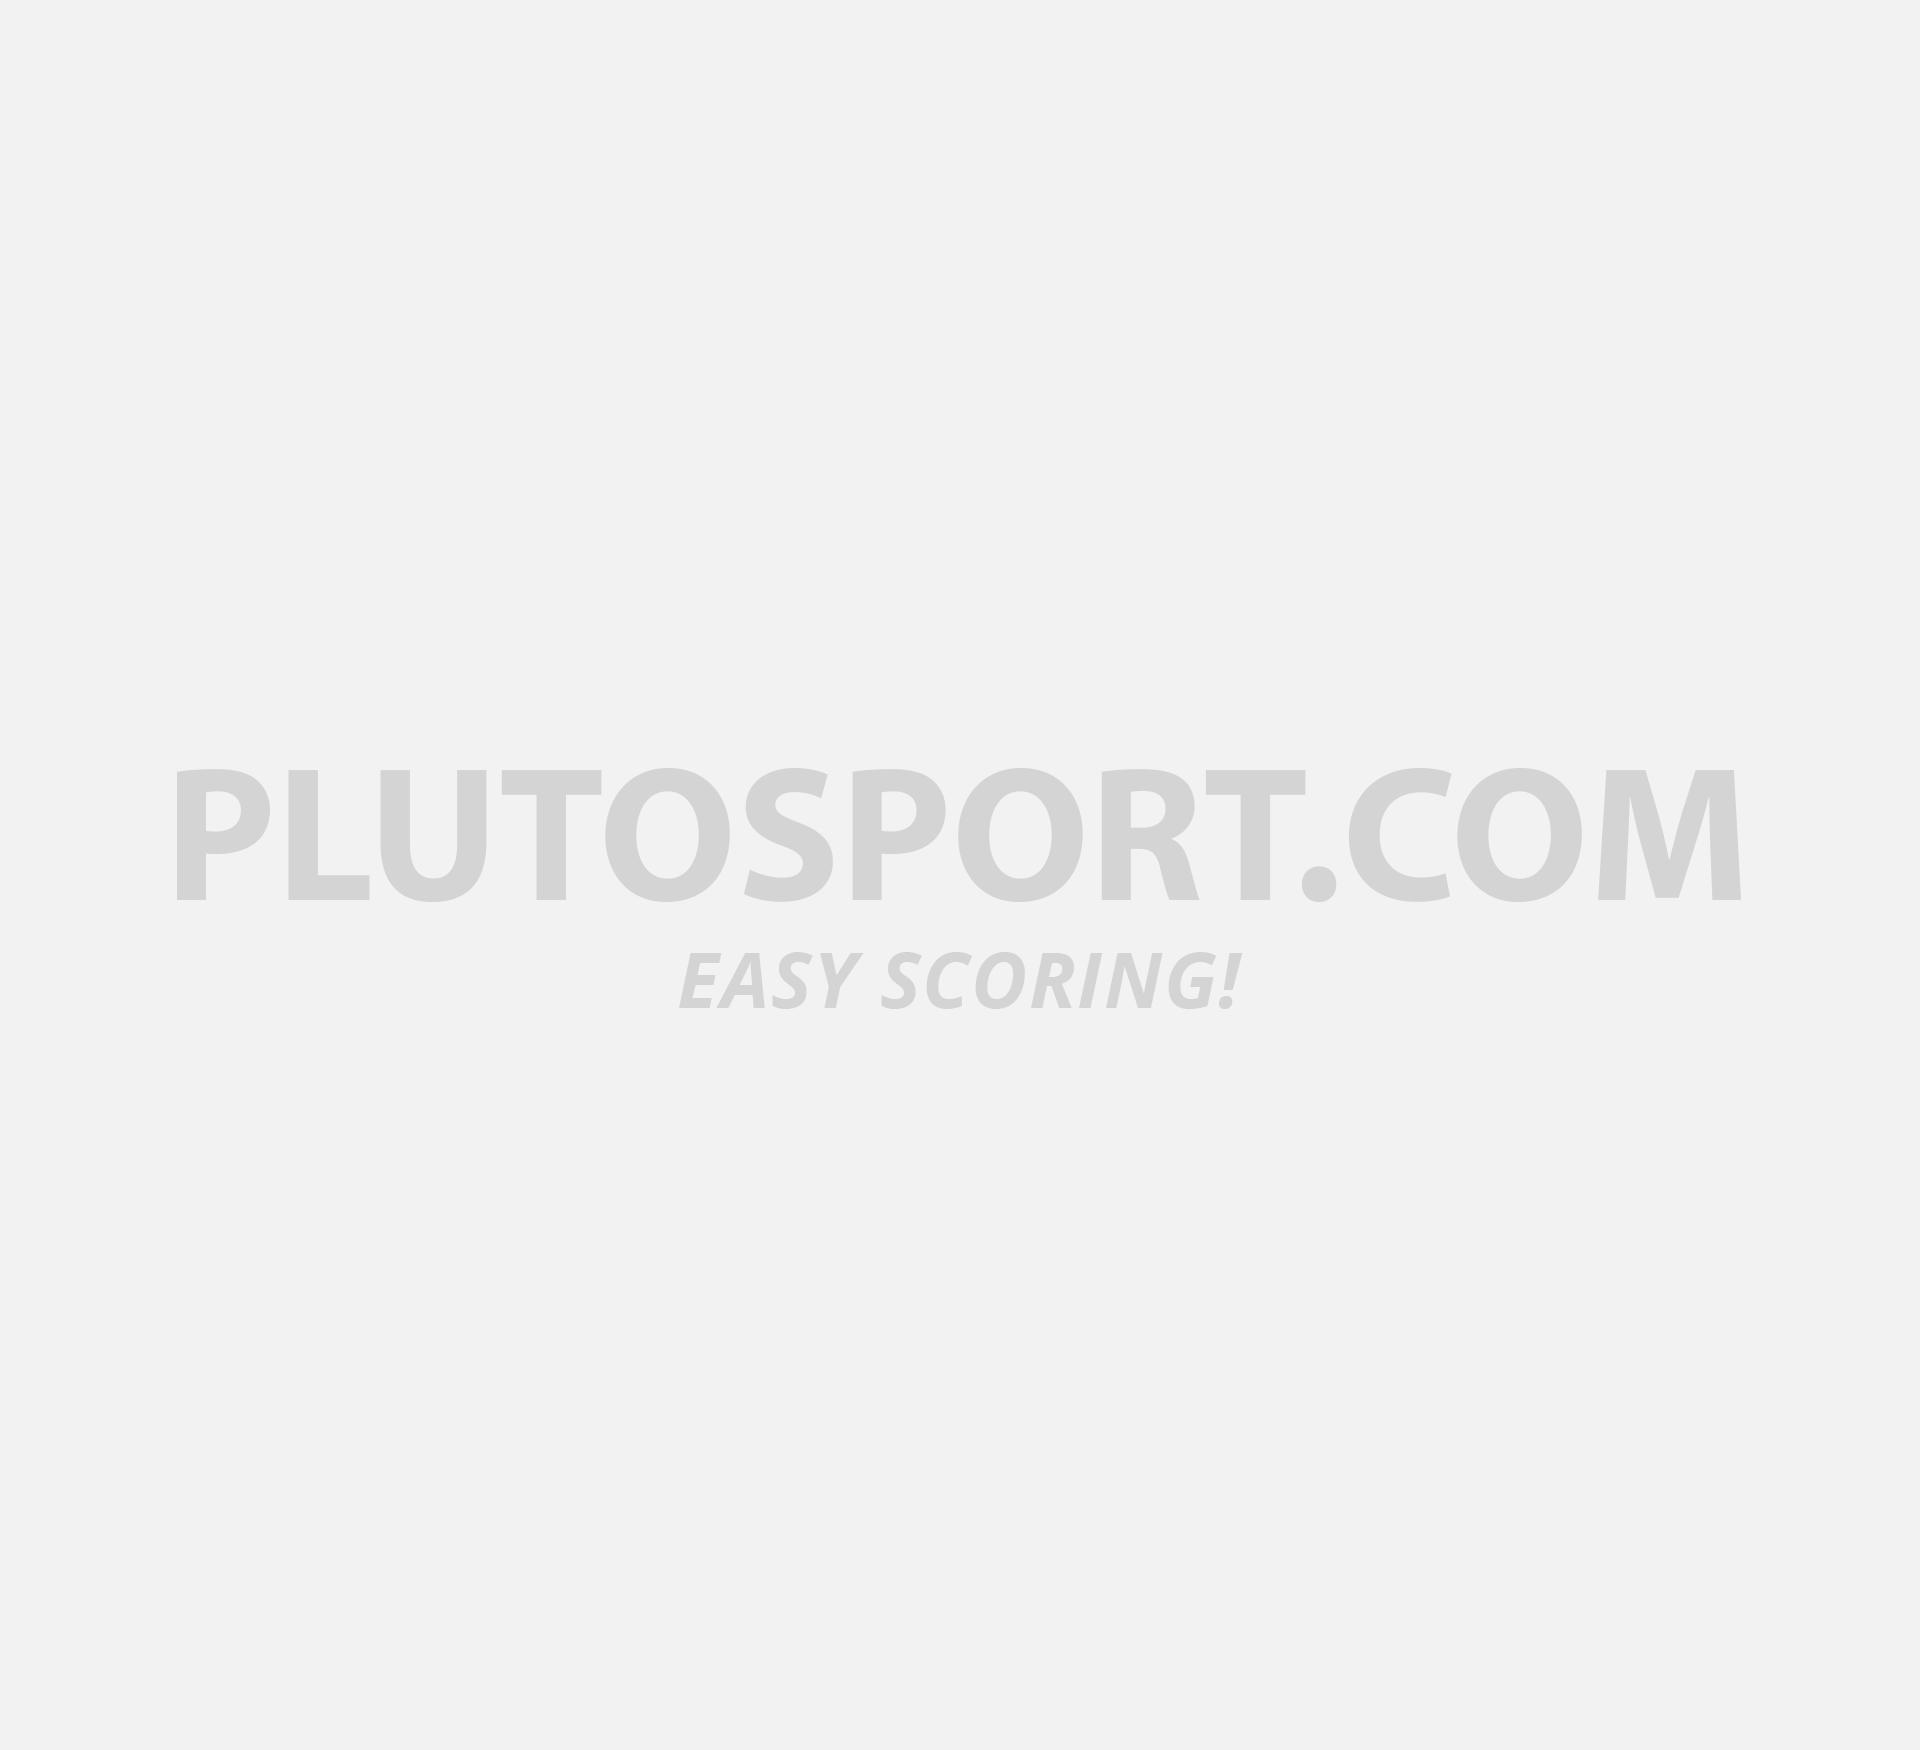 Asics Gel-Contend 7 Runningshoe Men